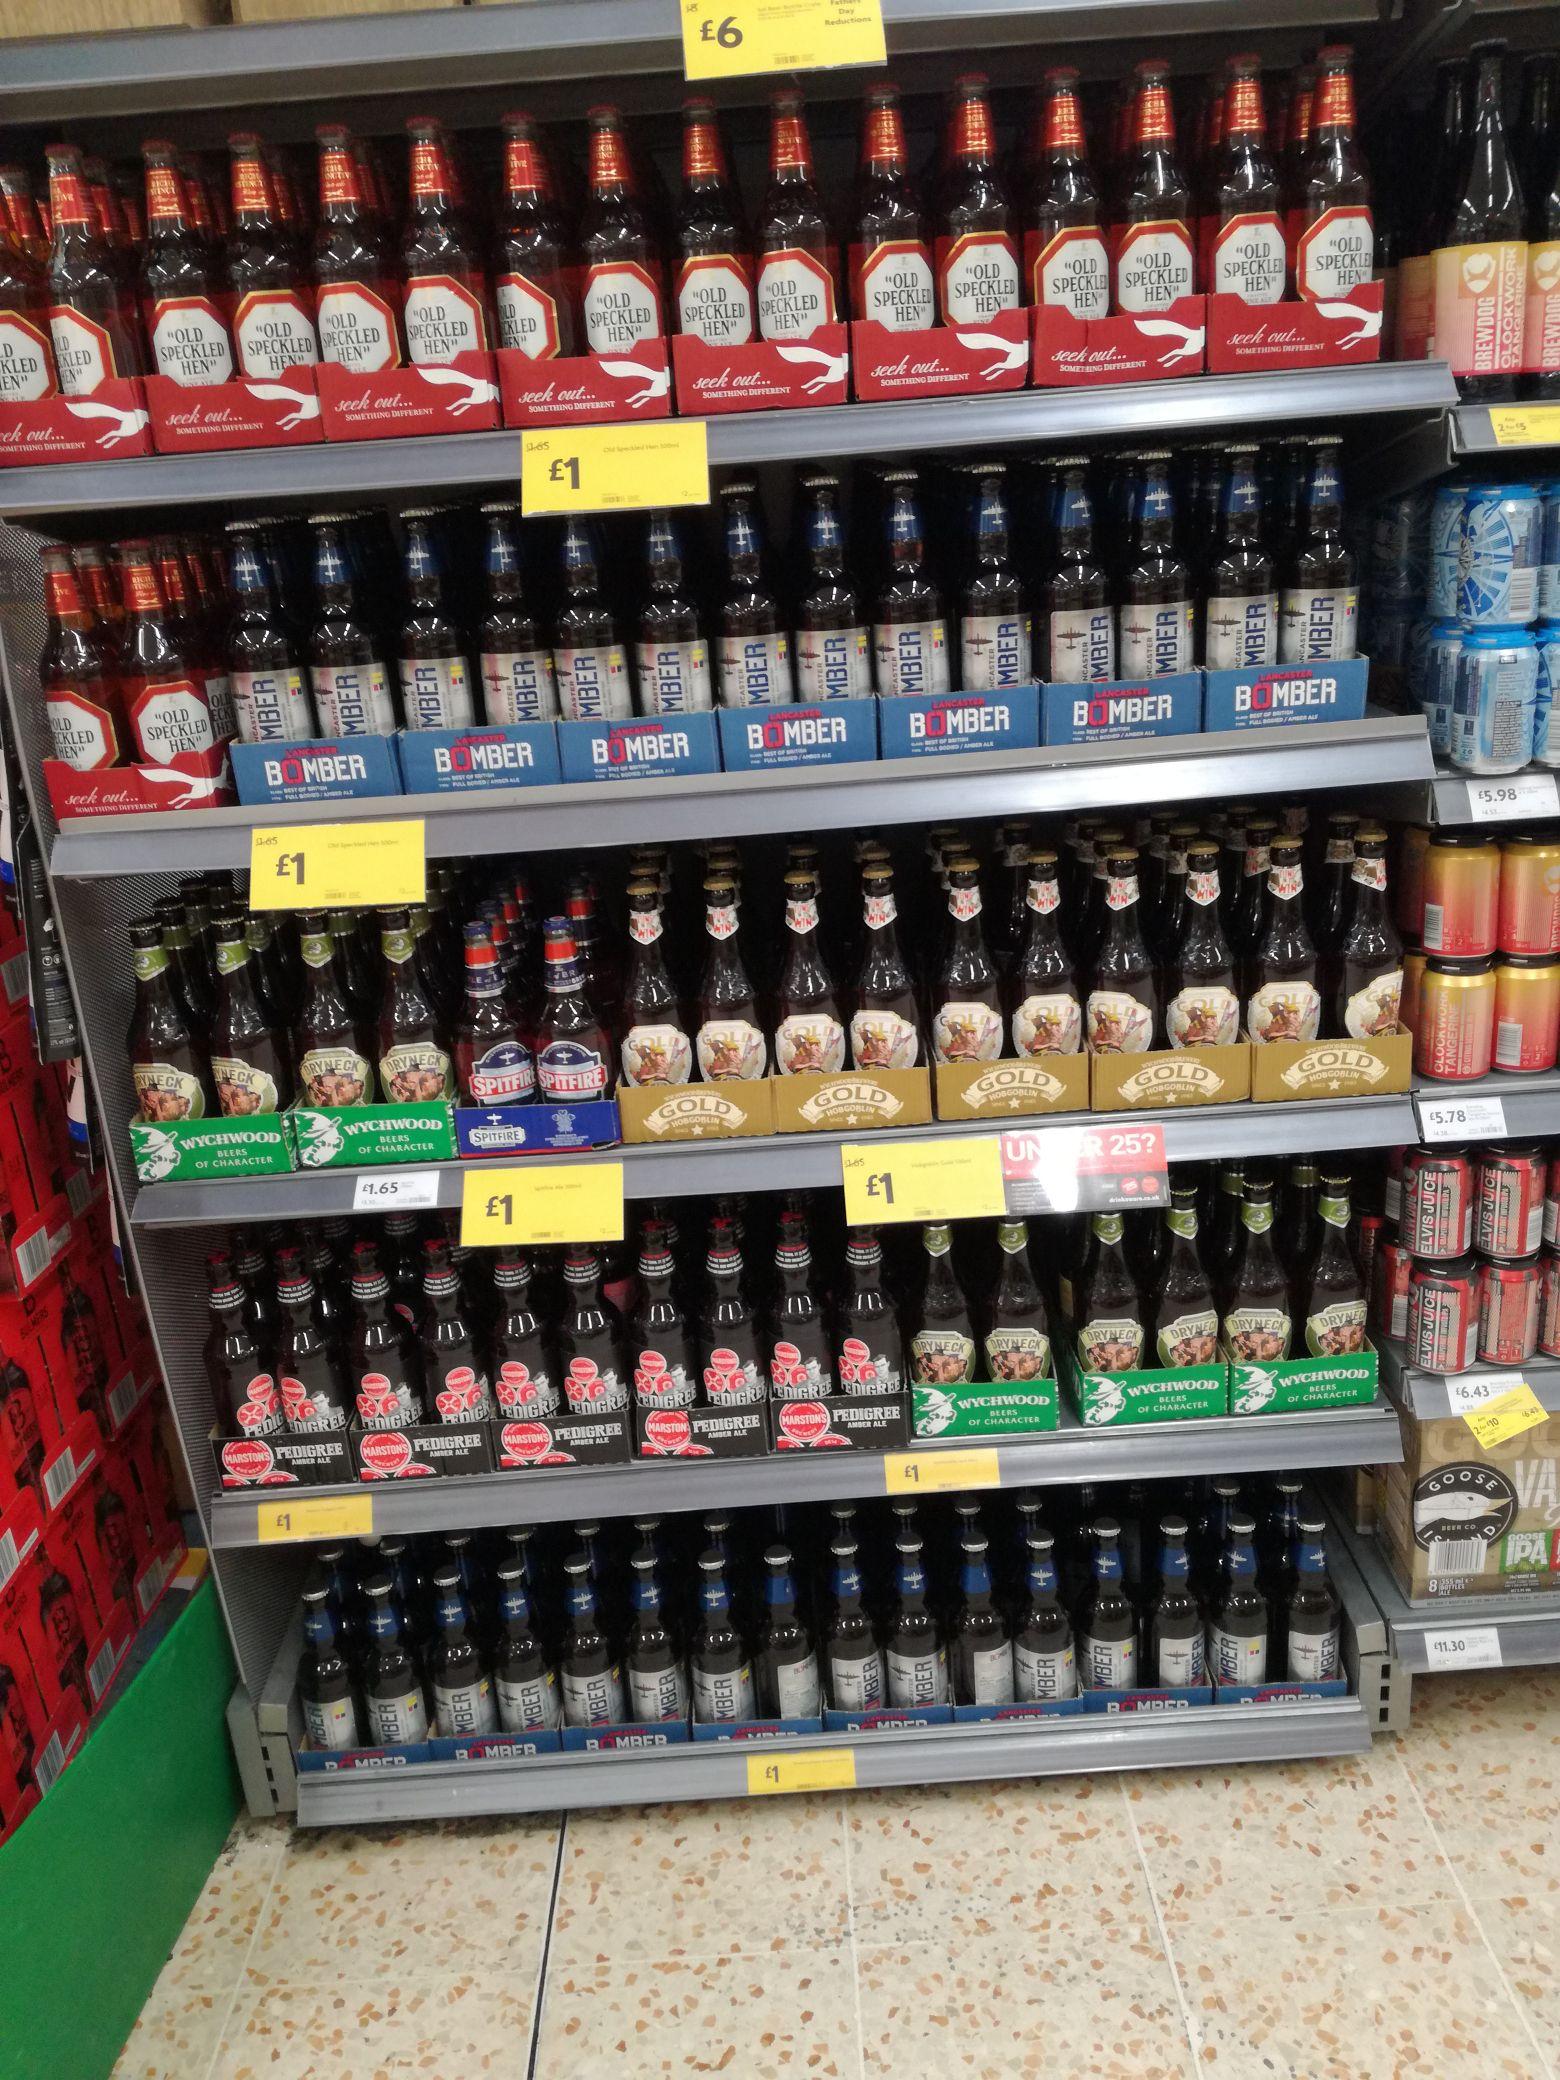 Real ale £1 bottles from £1.65 instore / online @ Morrisons